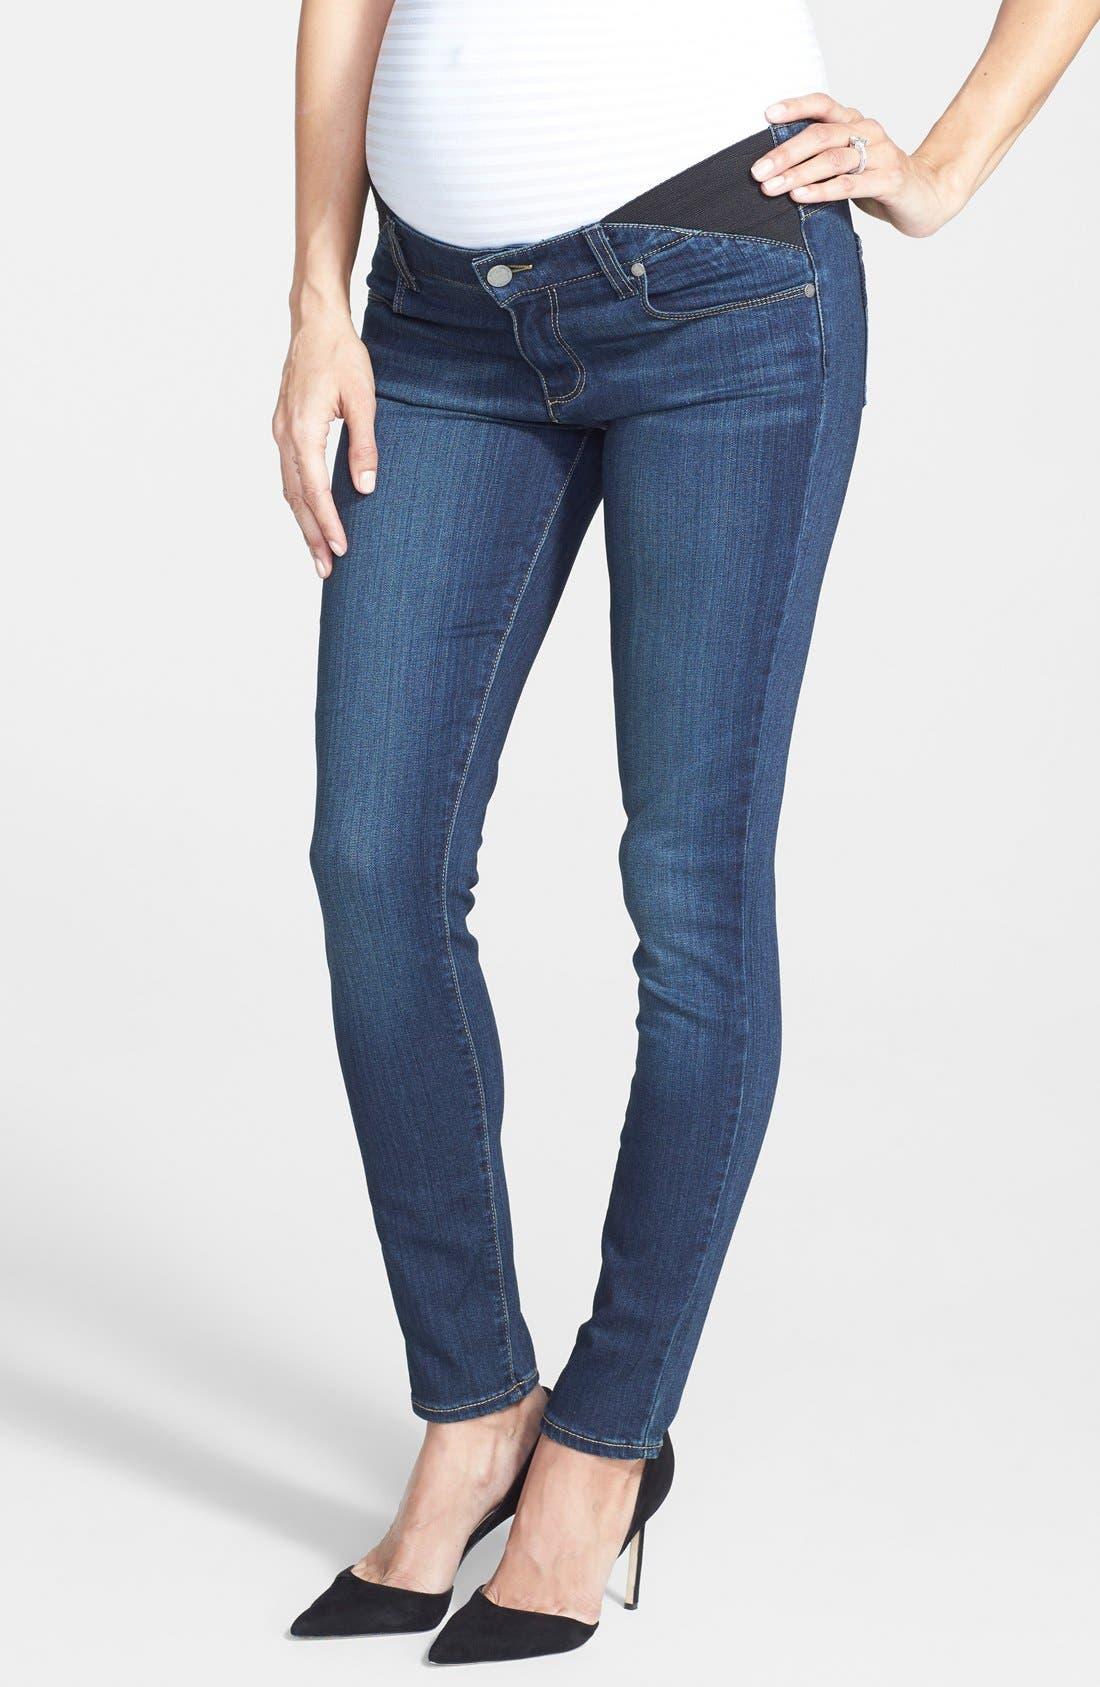 Alternate Image 1 Selected - Paige Denim 'Transcend - Verdugo' Maternity Jeans (Nottingham)